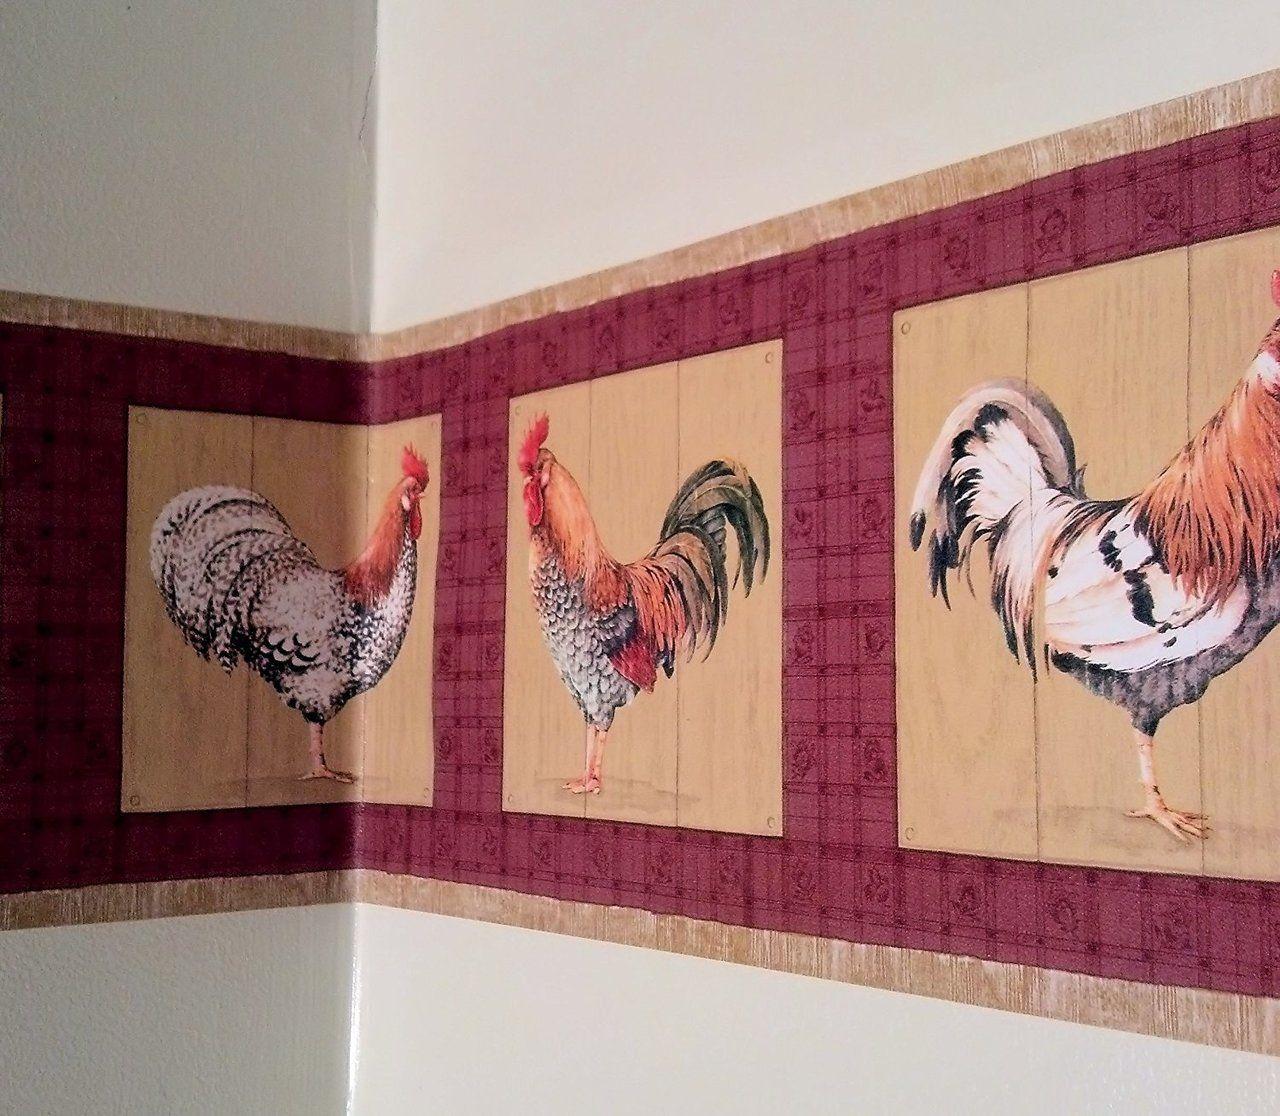 Rooster Farming Farm Country Barnyard Animal Wallpaper Border Red Wallpaper Border Animal Wallpaper Country Decor Diy